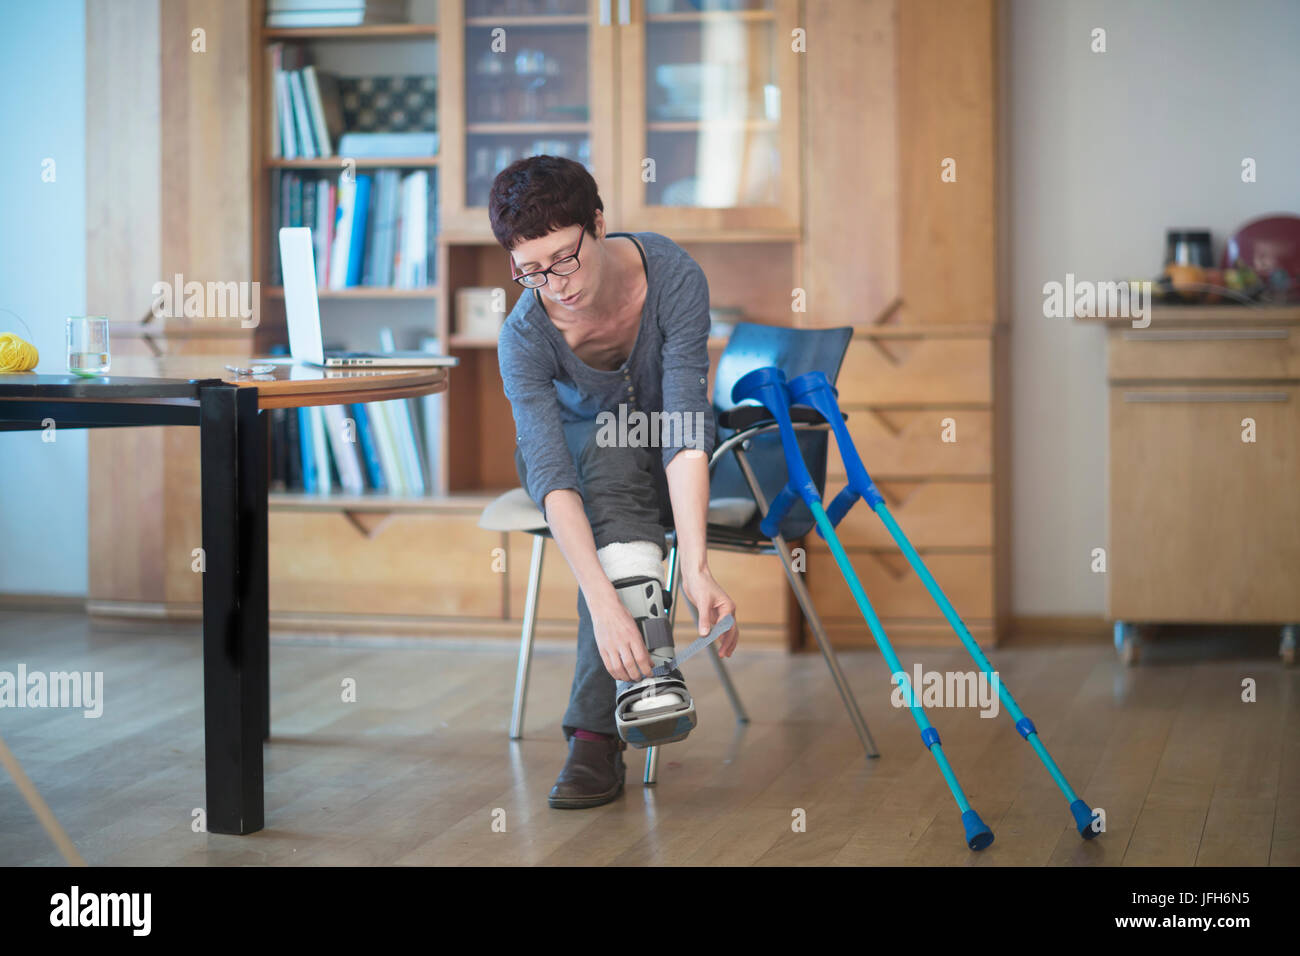 Hot mature wife leg braces and crutches